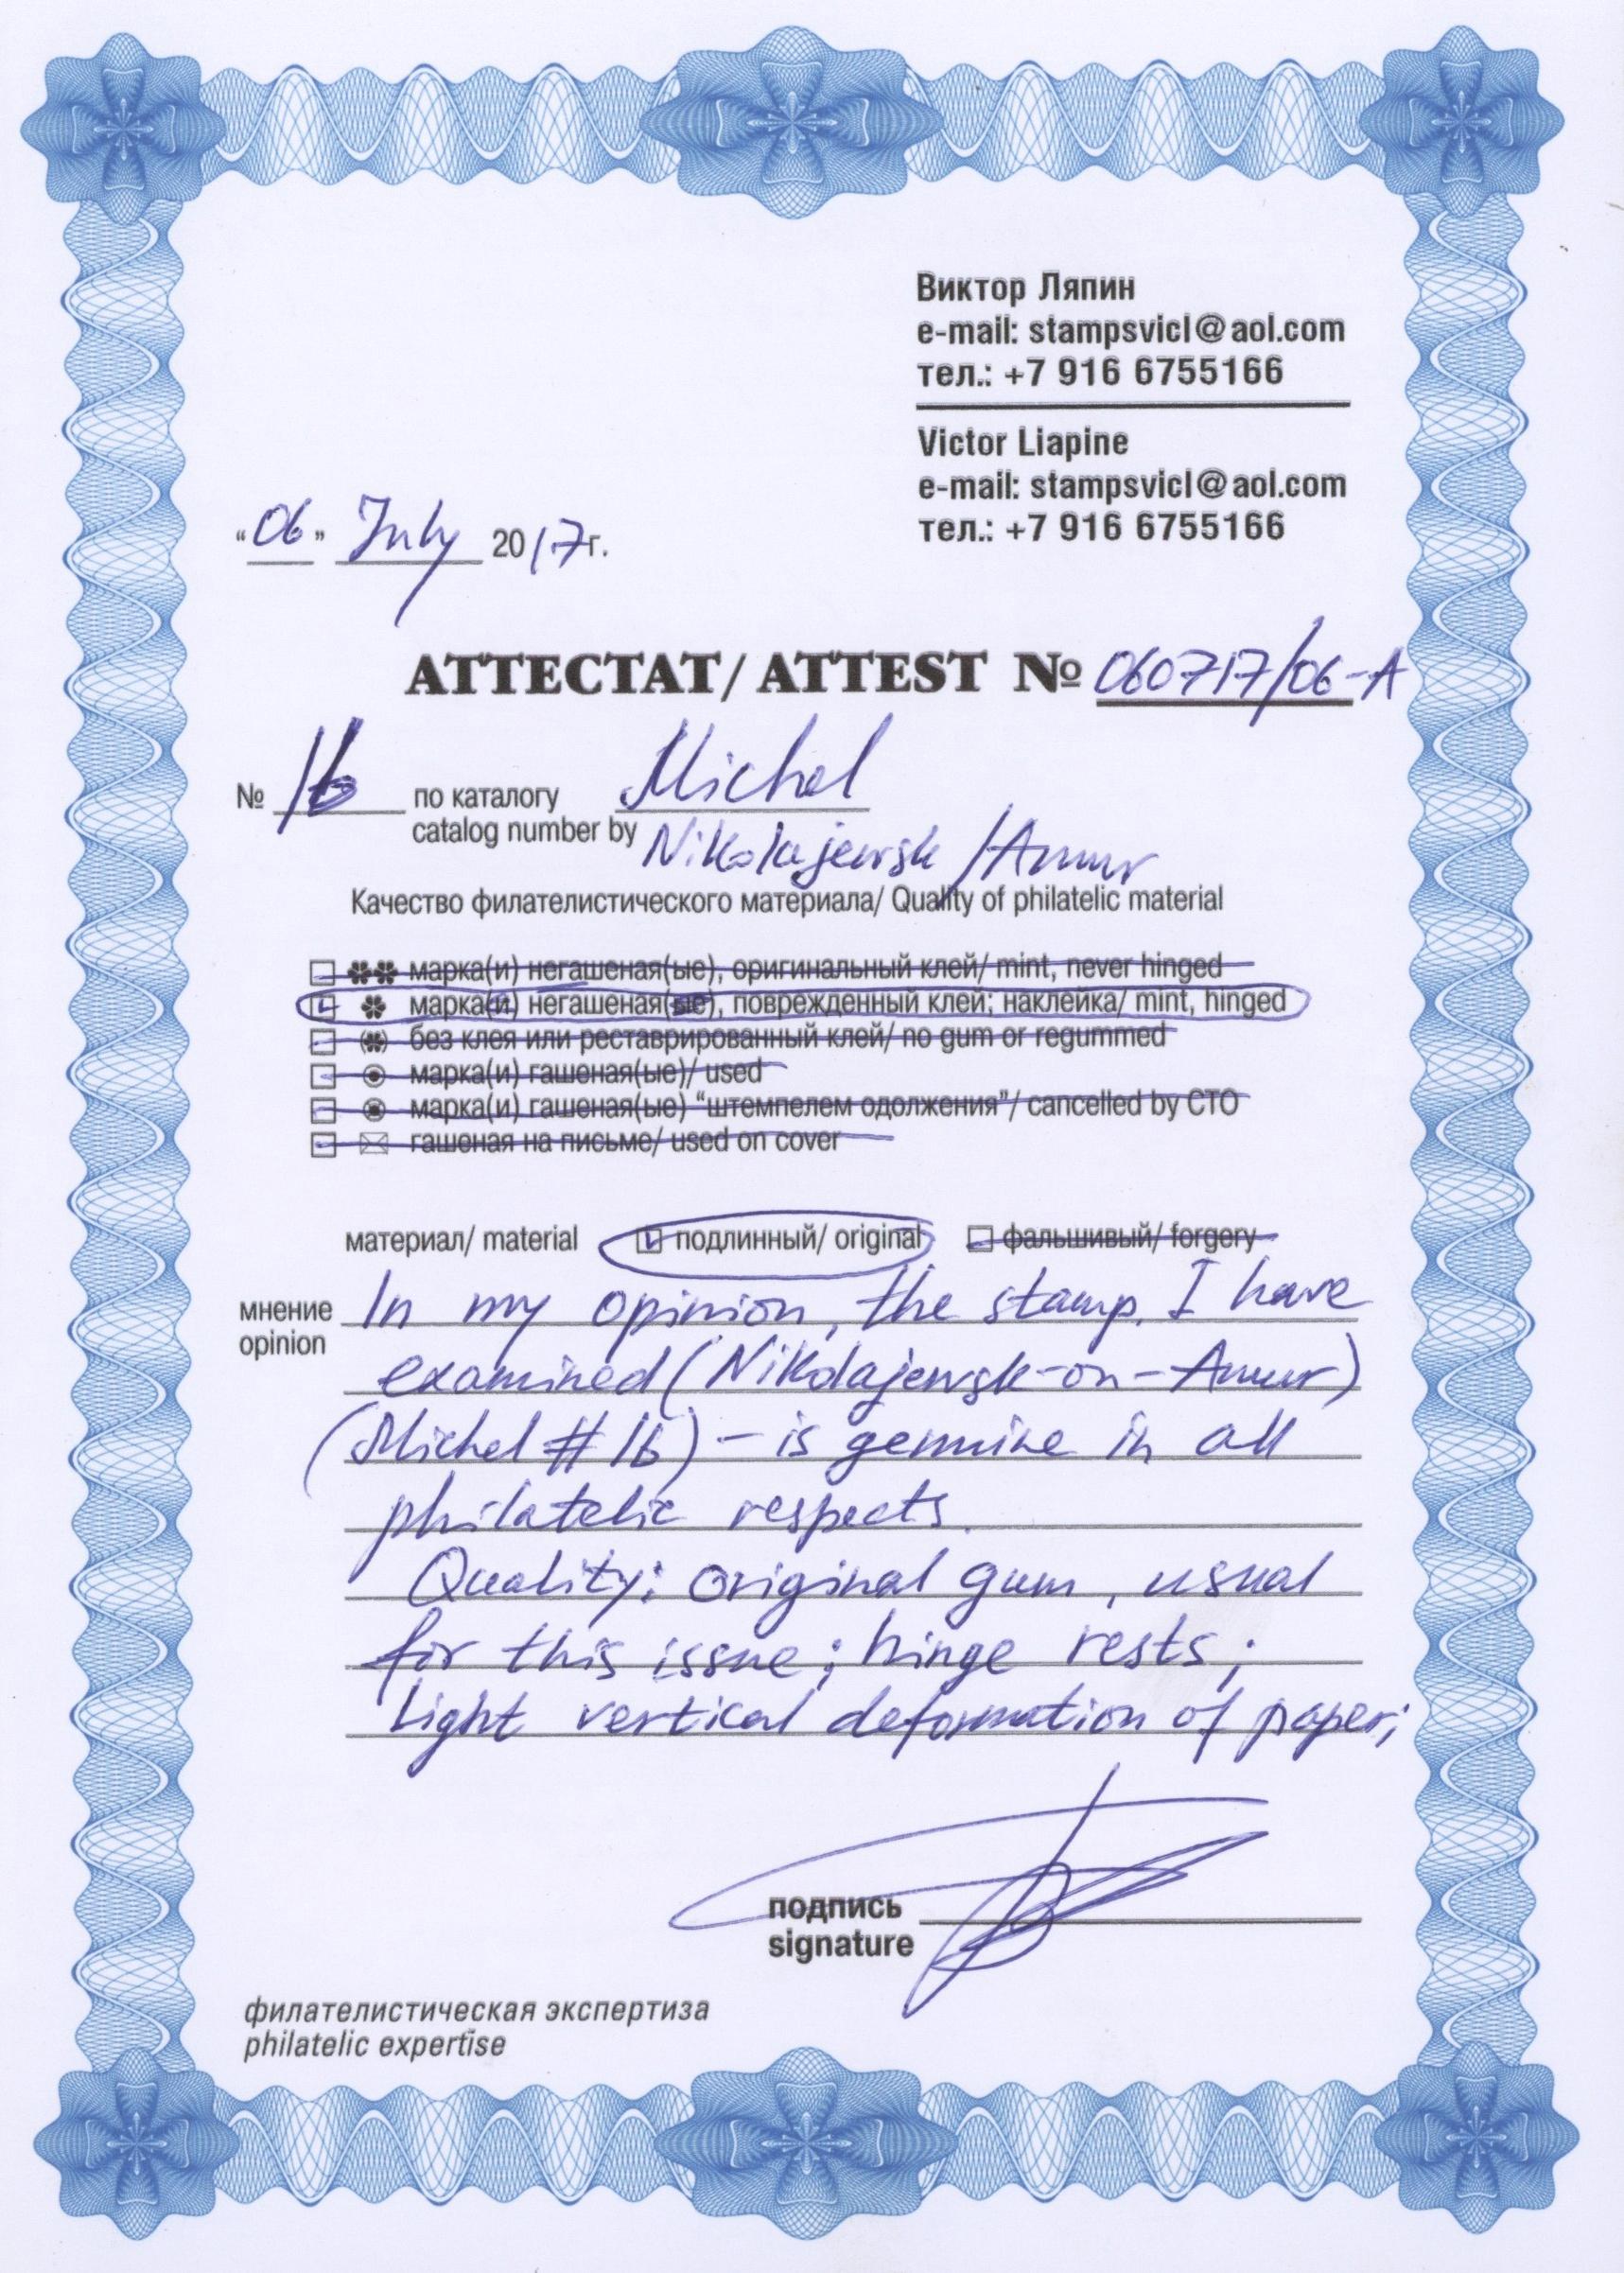 Lot 34875 - Russland - Post der Bürgerkriegsgebiete: Nikolajewsk / Amur / Priamur  -  Auktionshaus Christoph Gärtner GmbH & Co. KG Collections Germany,  Collections Supplement, Surprise boxes #39 Day 7